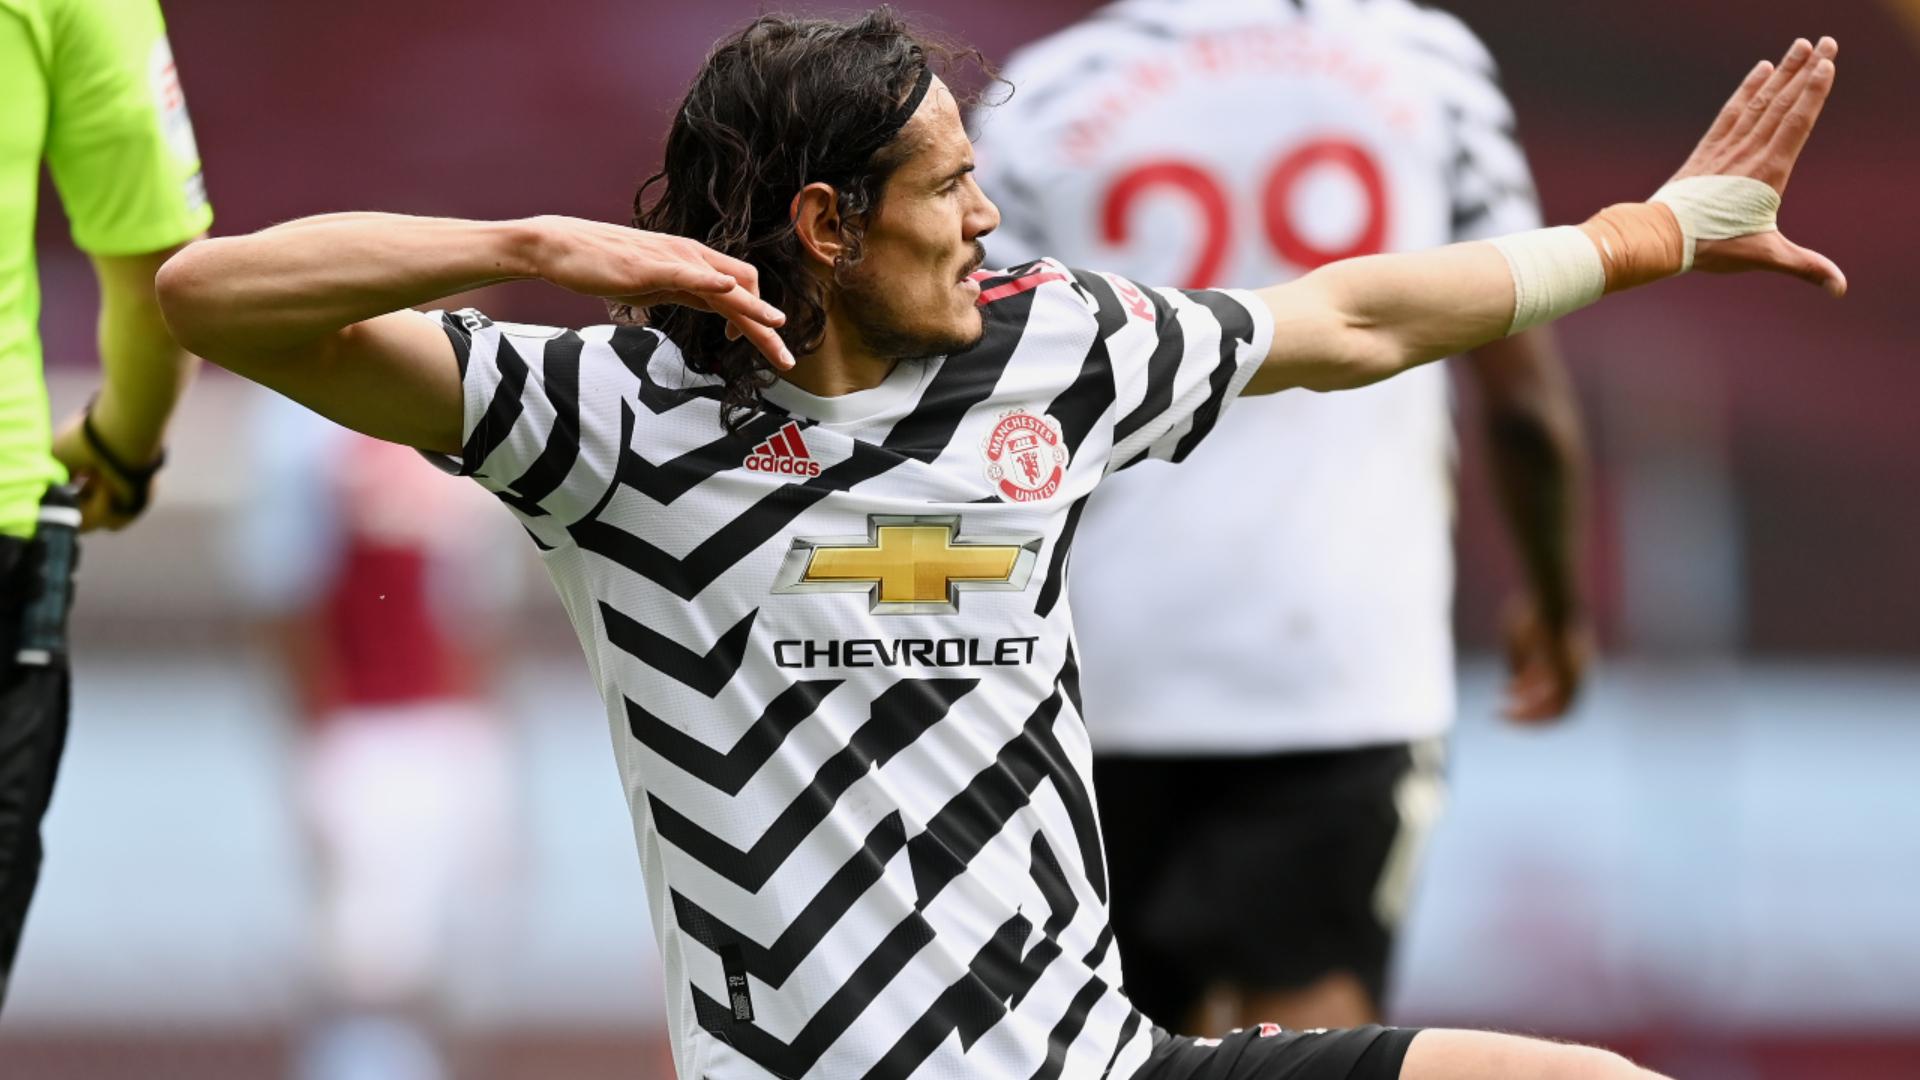 Cavani to stay? Solskjaer talks up next season for Man Utd striker after latest goal